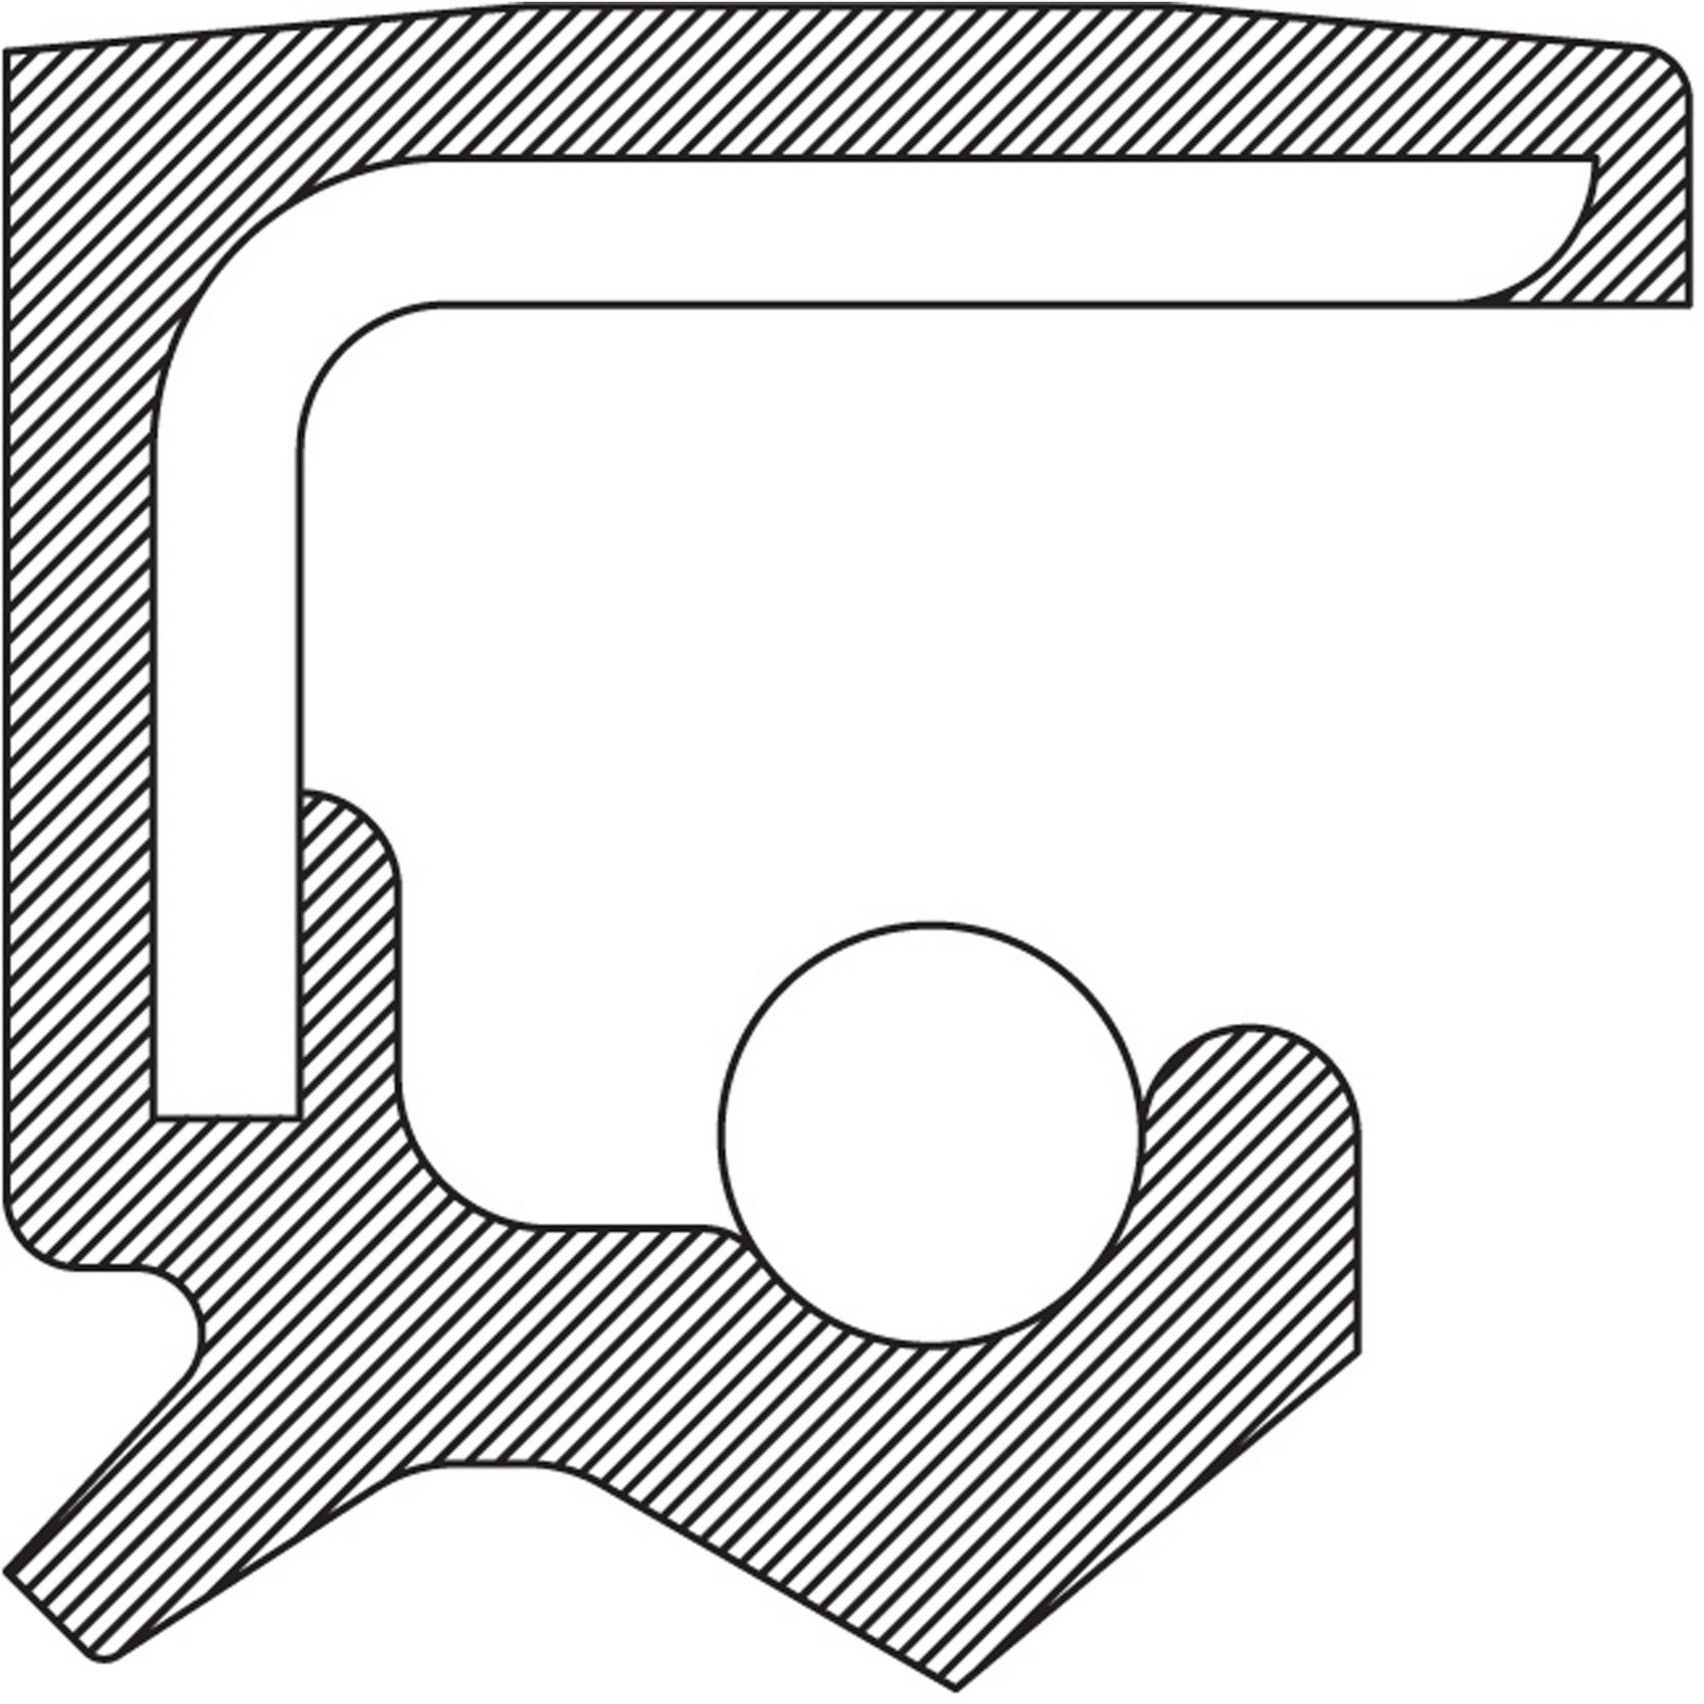 Dodge Ram 3500 Transfer Case Input Shaft Seal Replacement